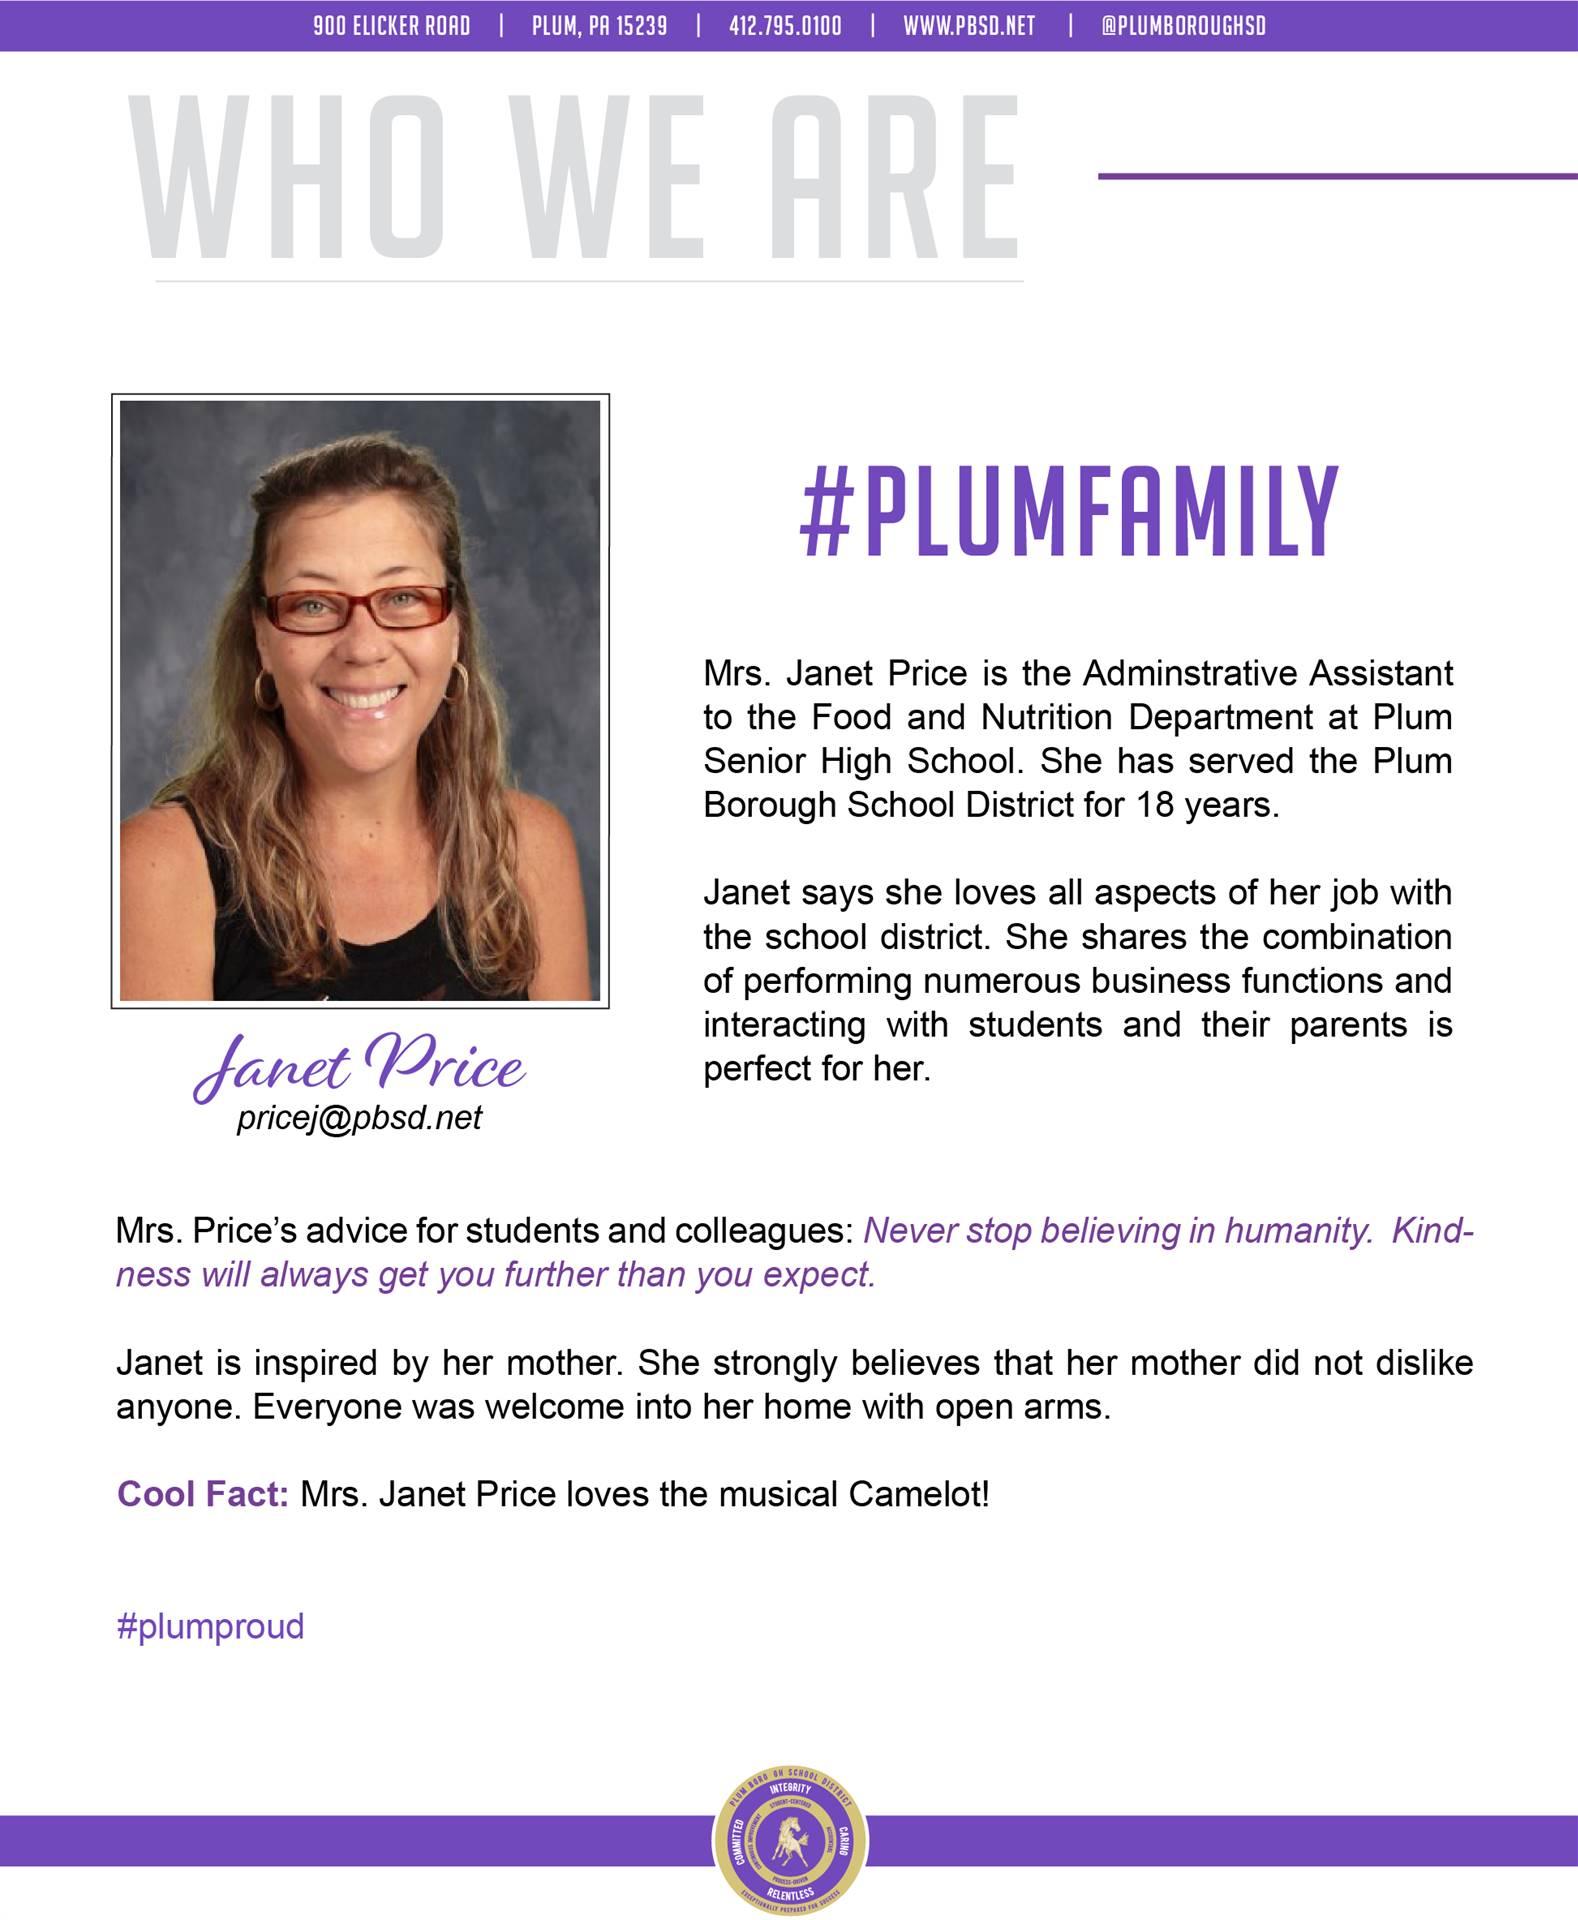 #PlumFamily